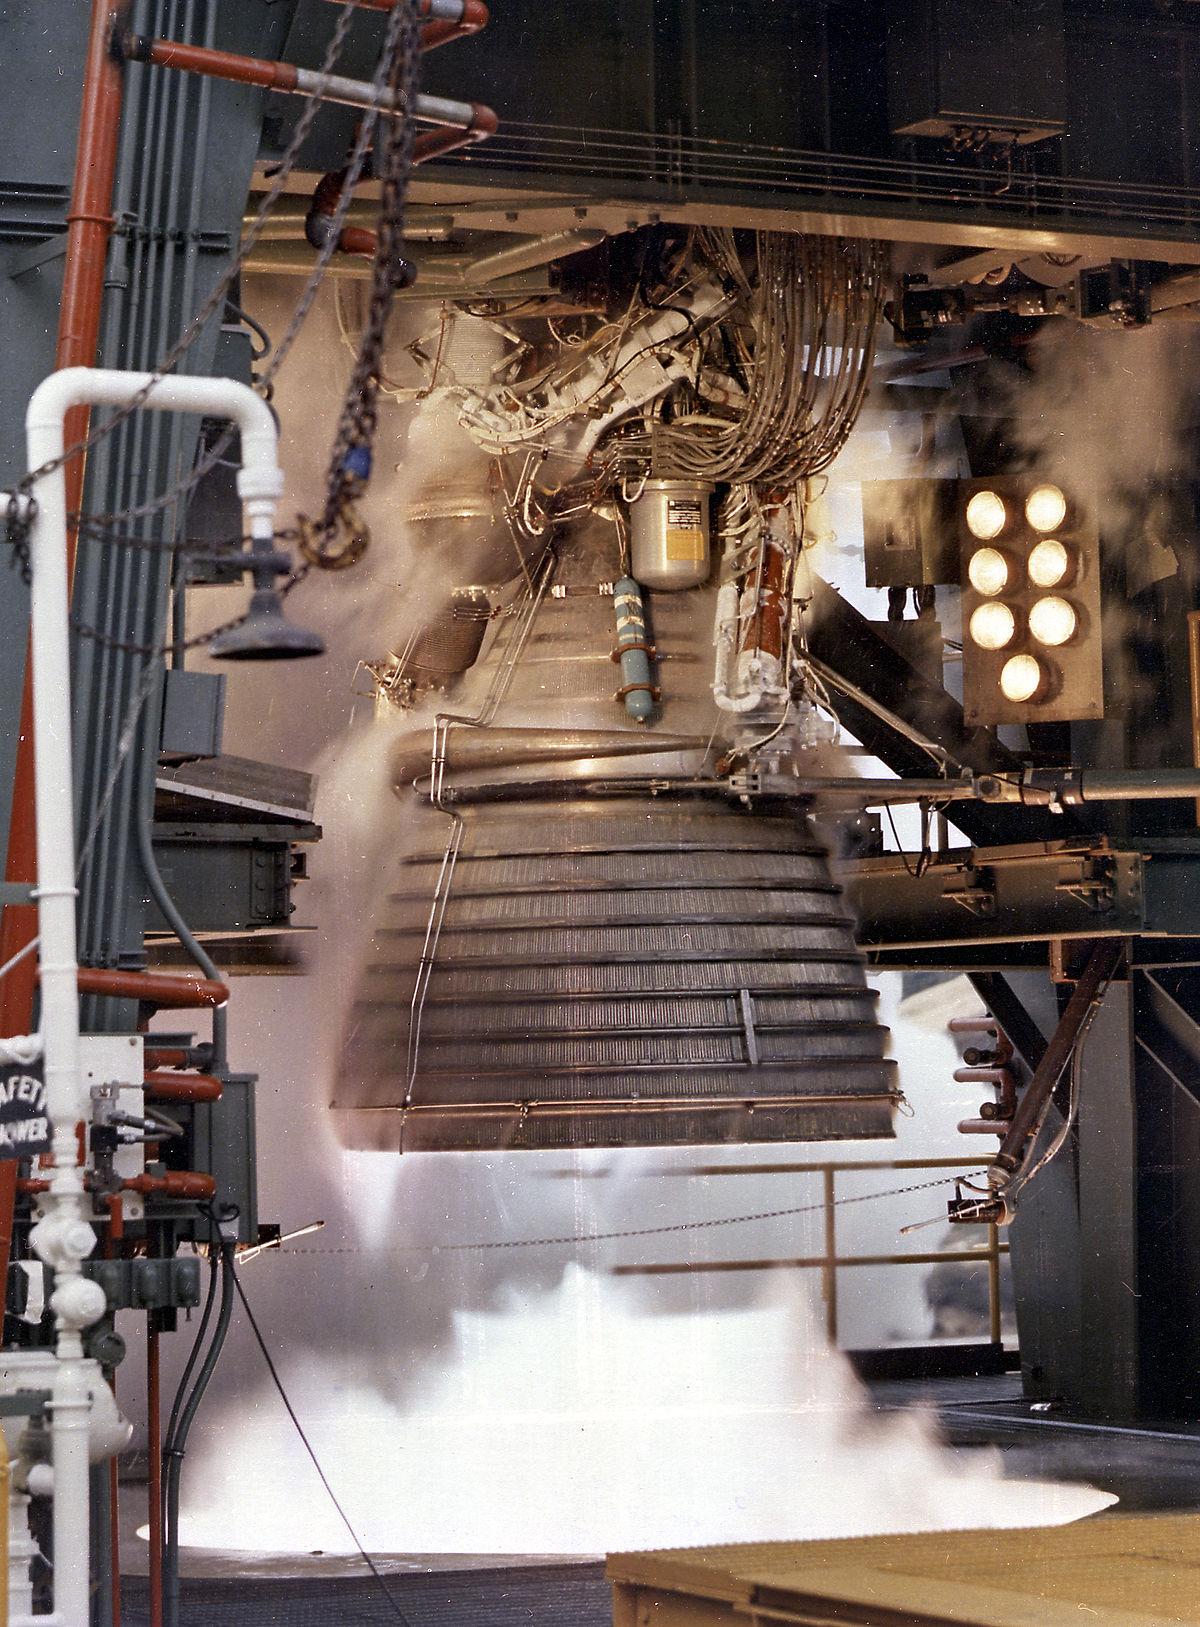 Px J Test Firing on Pressure Chamber Rocket Engine